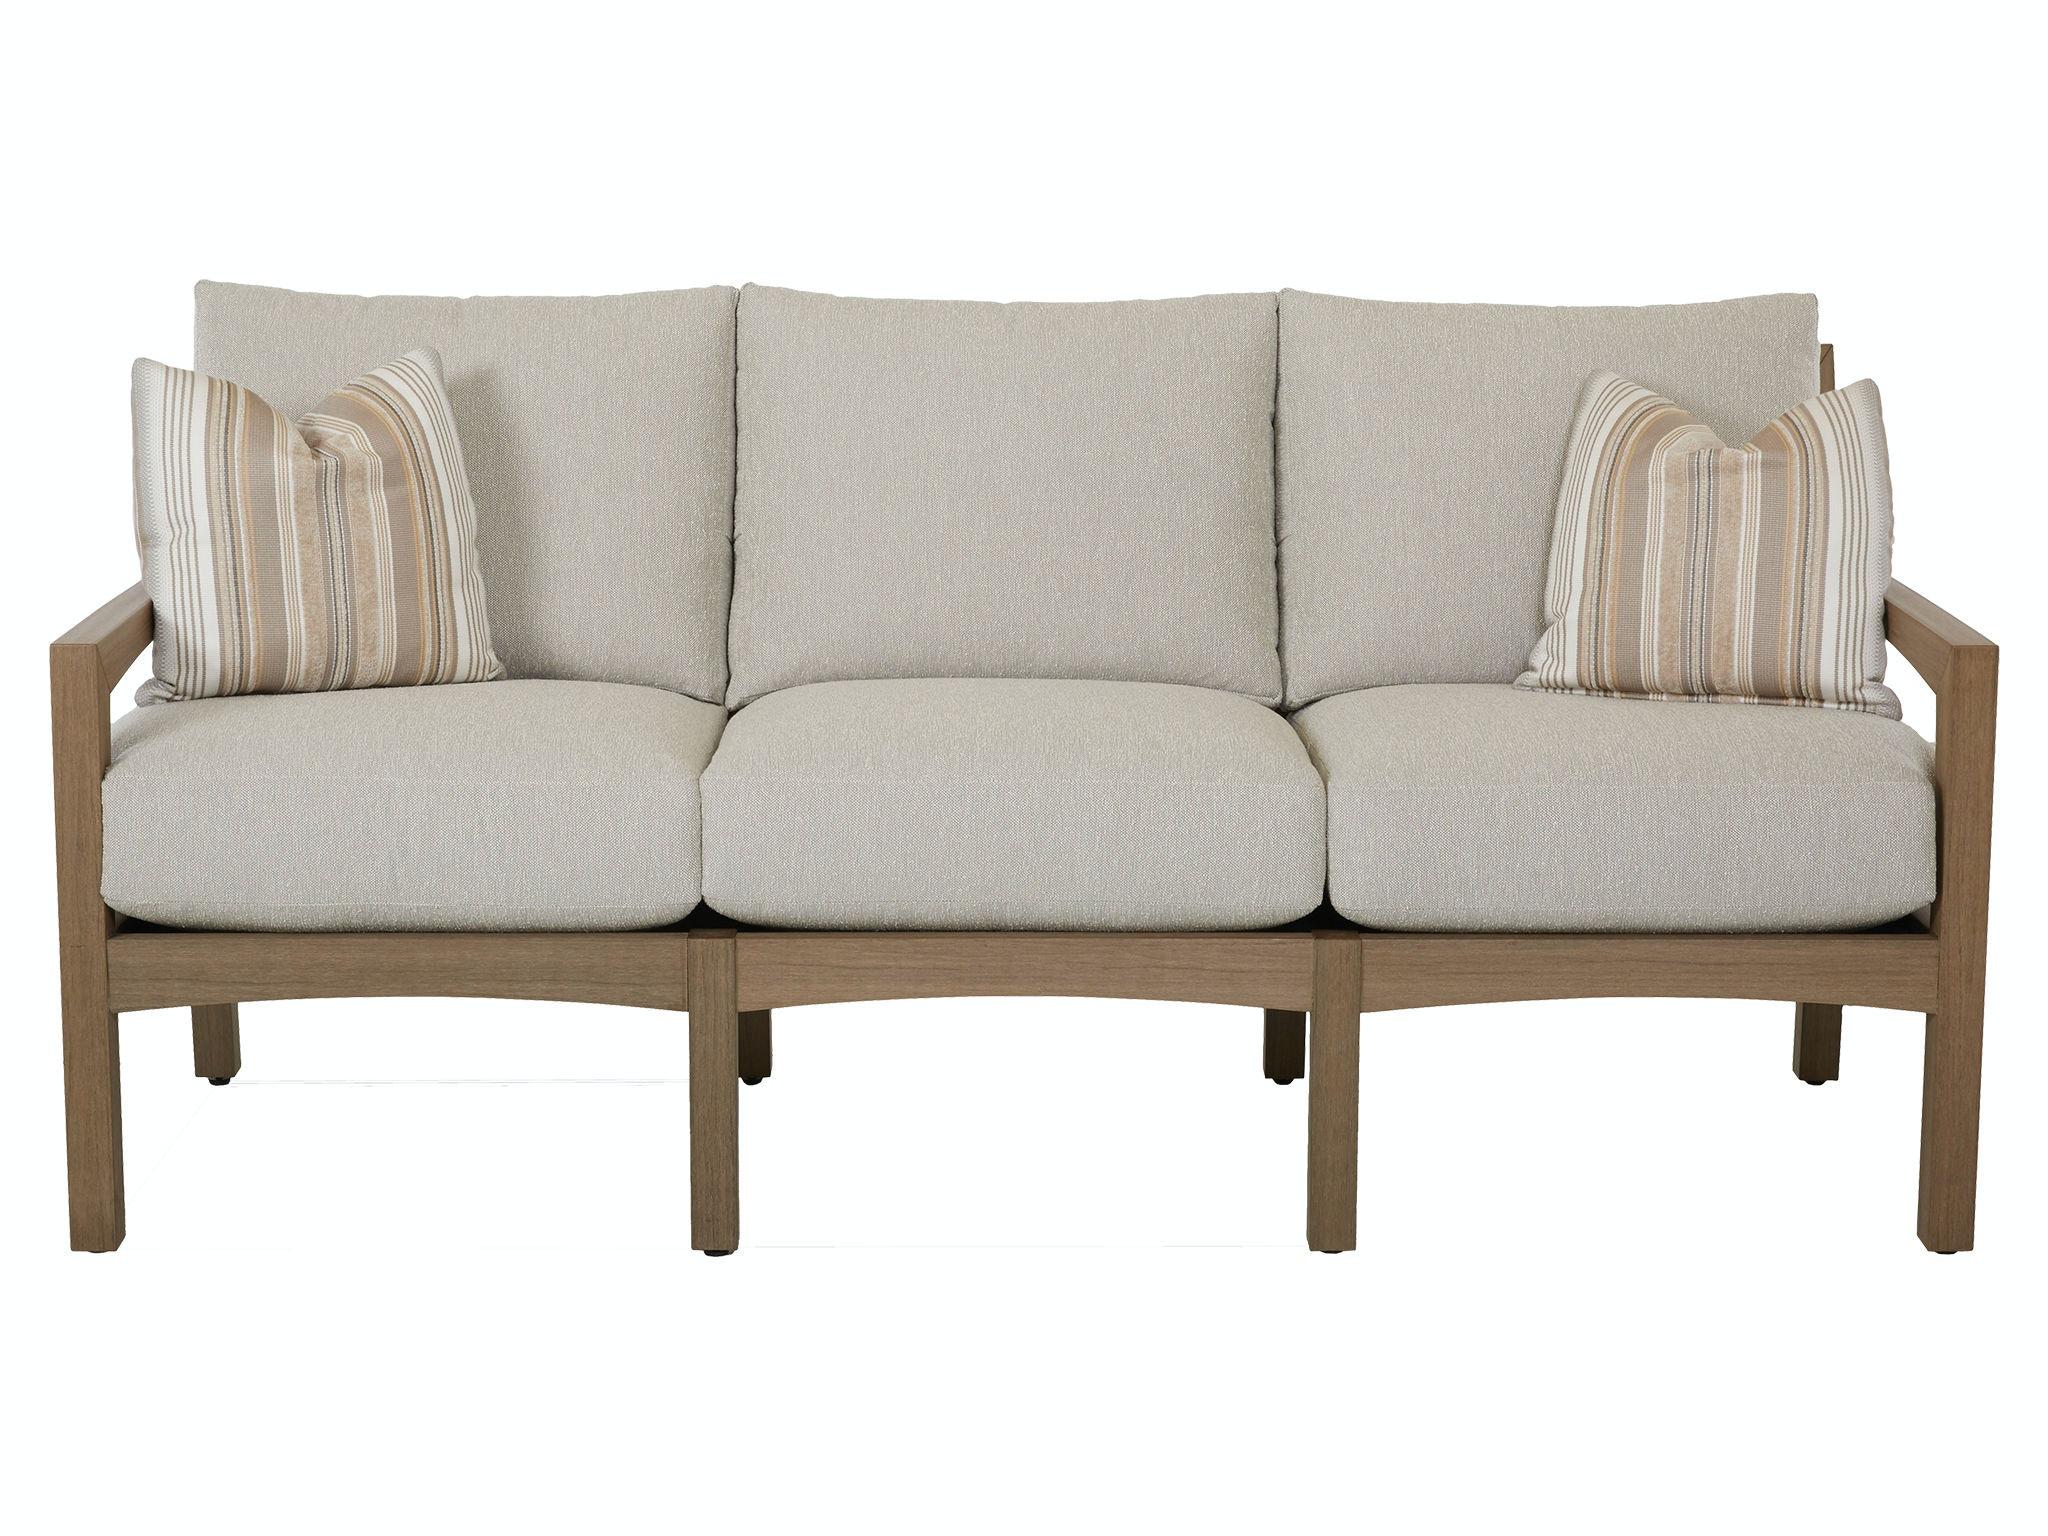 Klaussner Outdoor Delray Sofa W8502 S